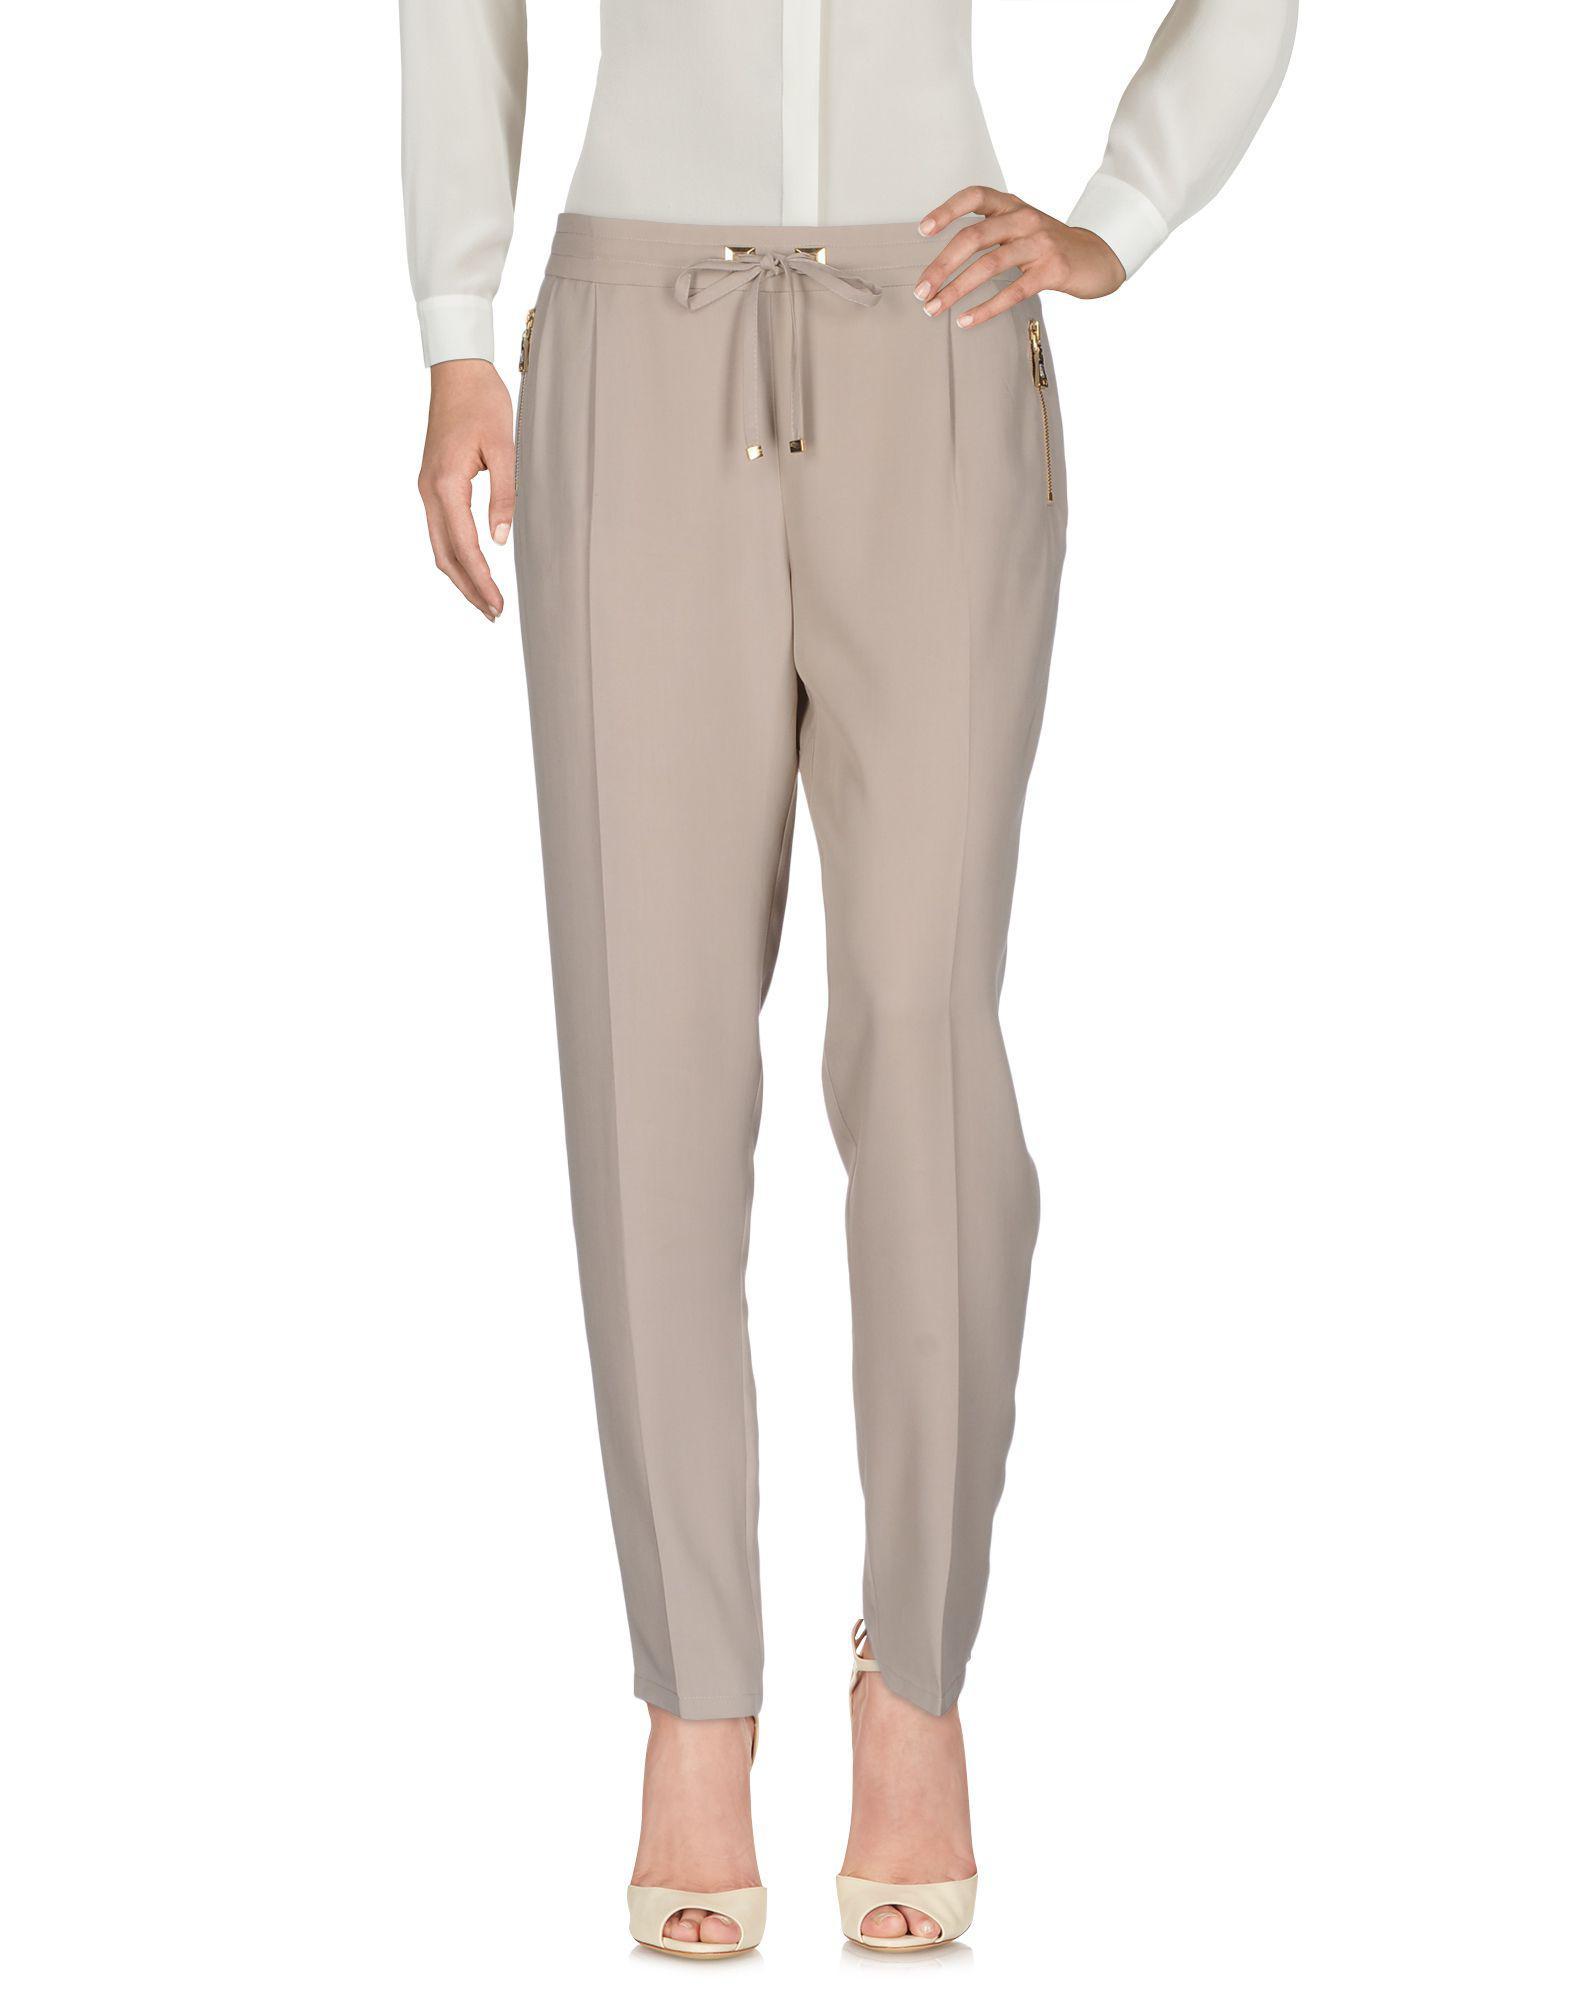 TROUSERS - 3/4-length trousers Angelo Marani MjjRT7y63